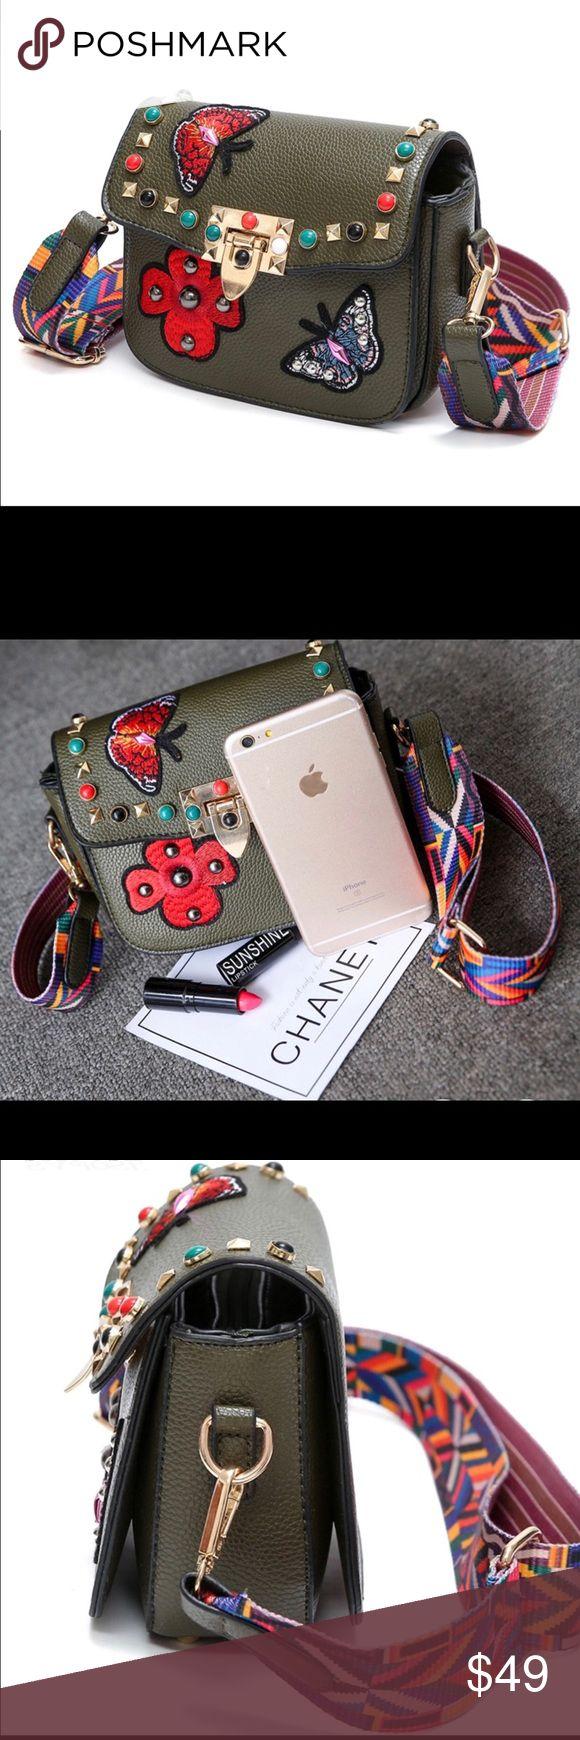 🌺💥Gorgeous Hot Women Crossbody Luxury Handbag 🌟✨Absolutely stunning designer luxury handbag with flowers. Make an offer while it lasts! Bags Crossbody Bags